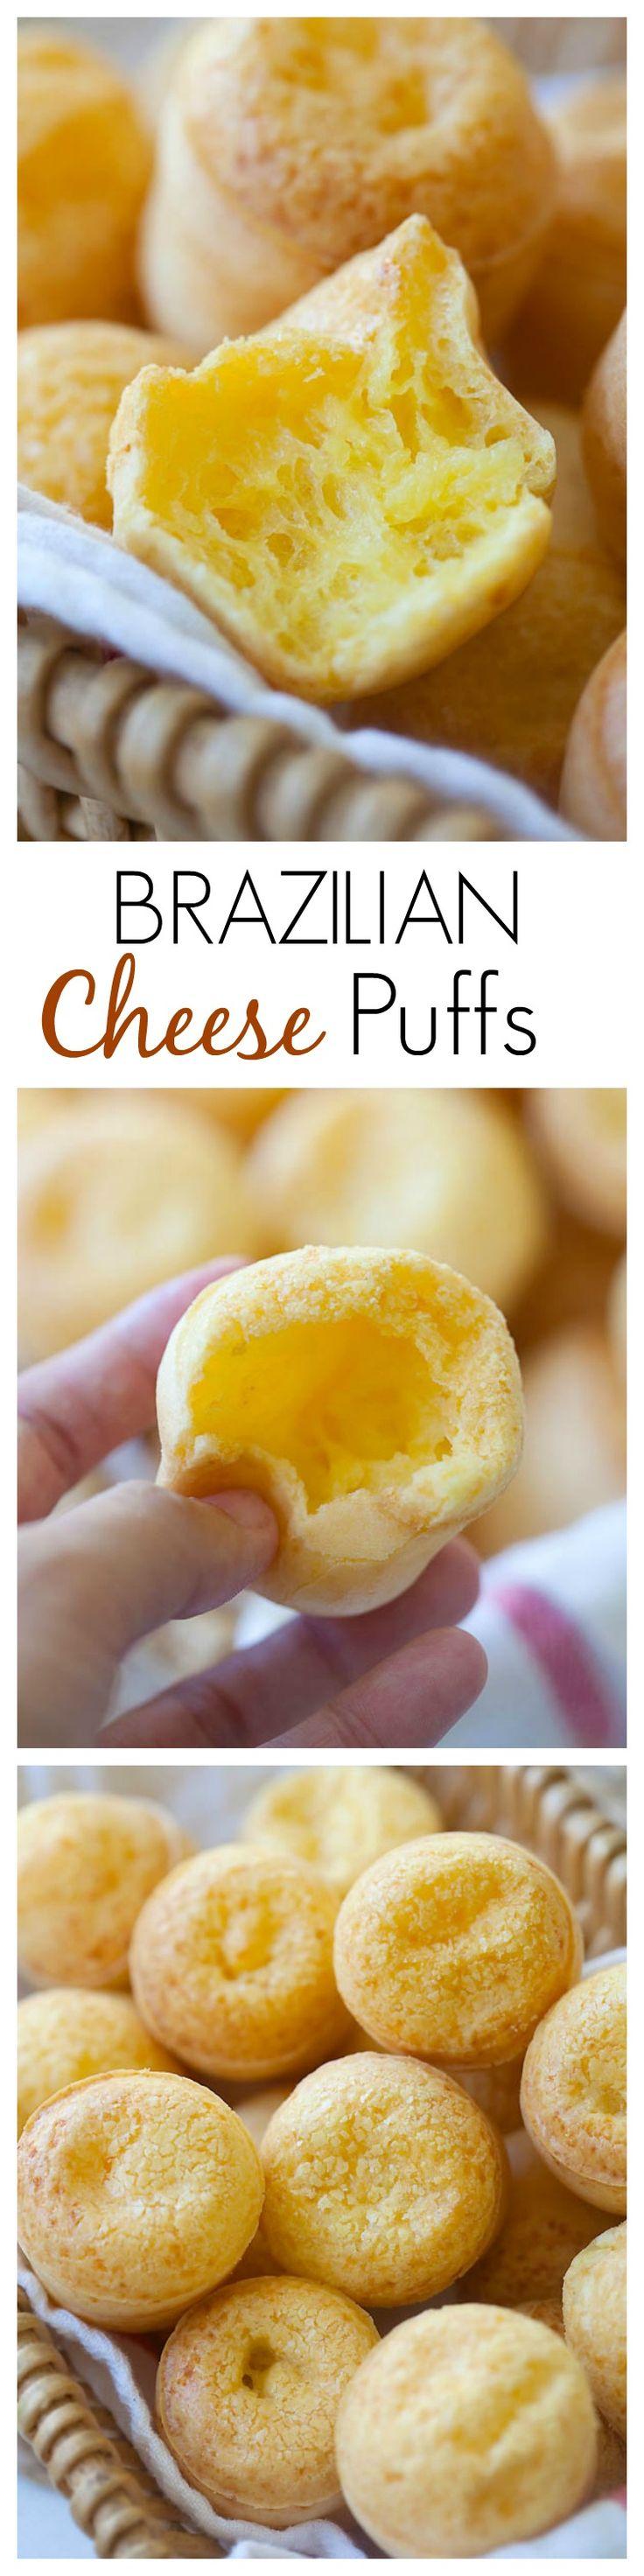 brazilian-cheese-puffs.jpg